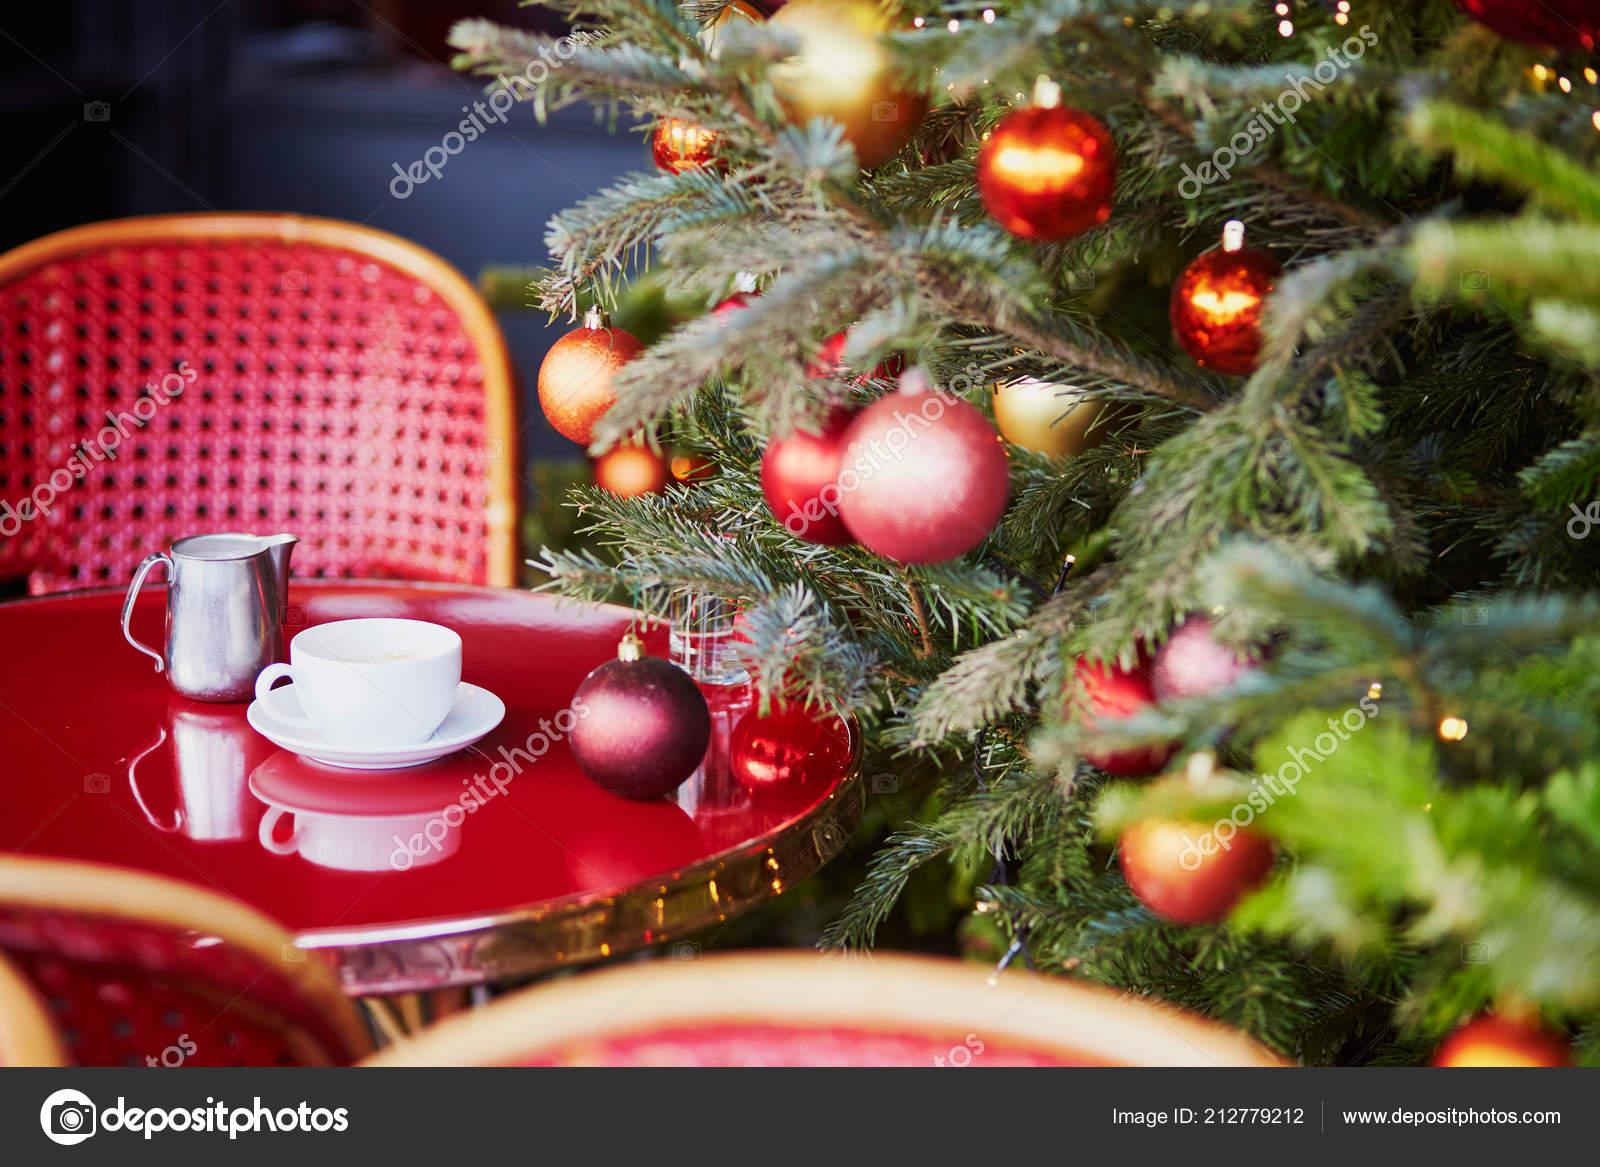 Outdoor Parisian Cafe Beautiful Christmas Tree Decorated Season Holidays Stock Photo C Encrier 212779212